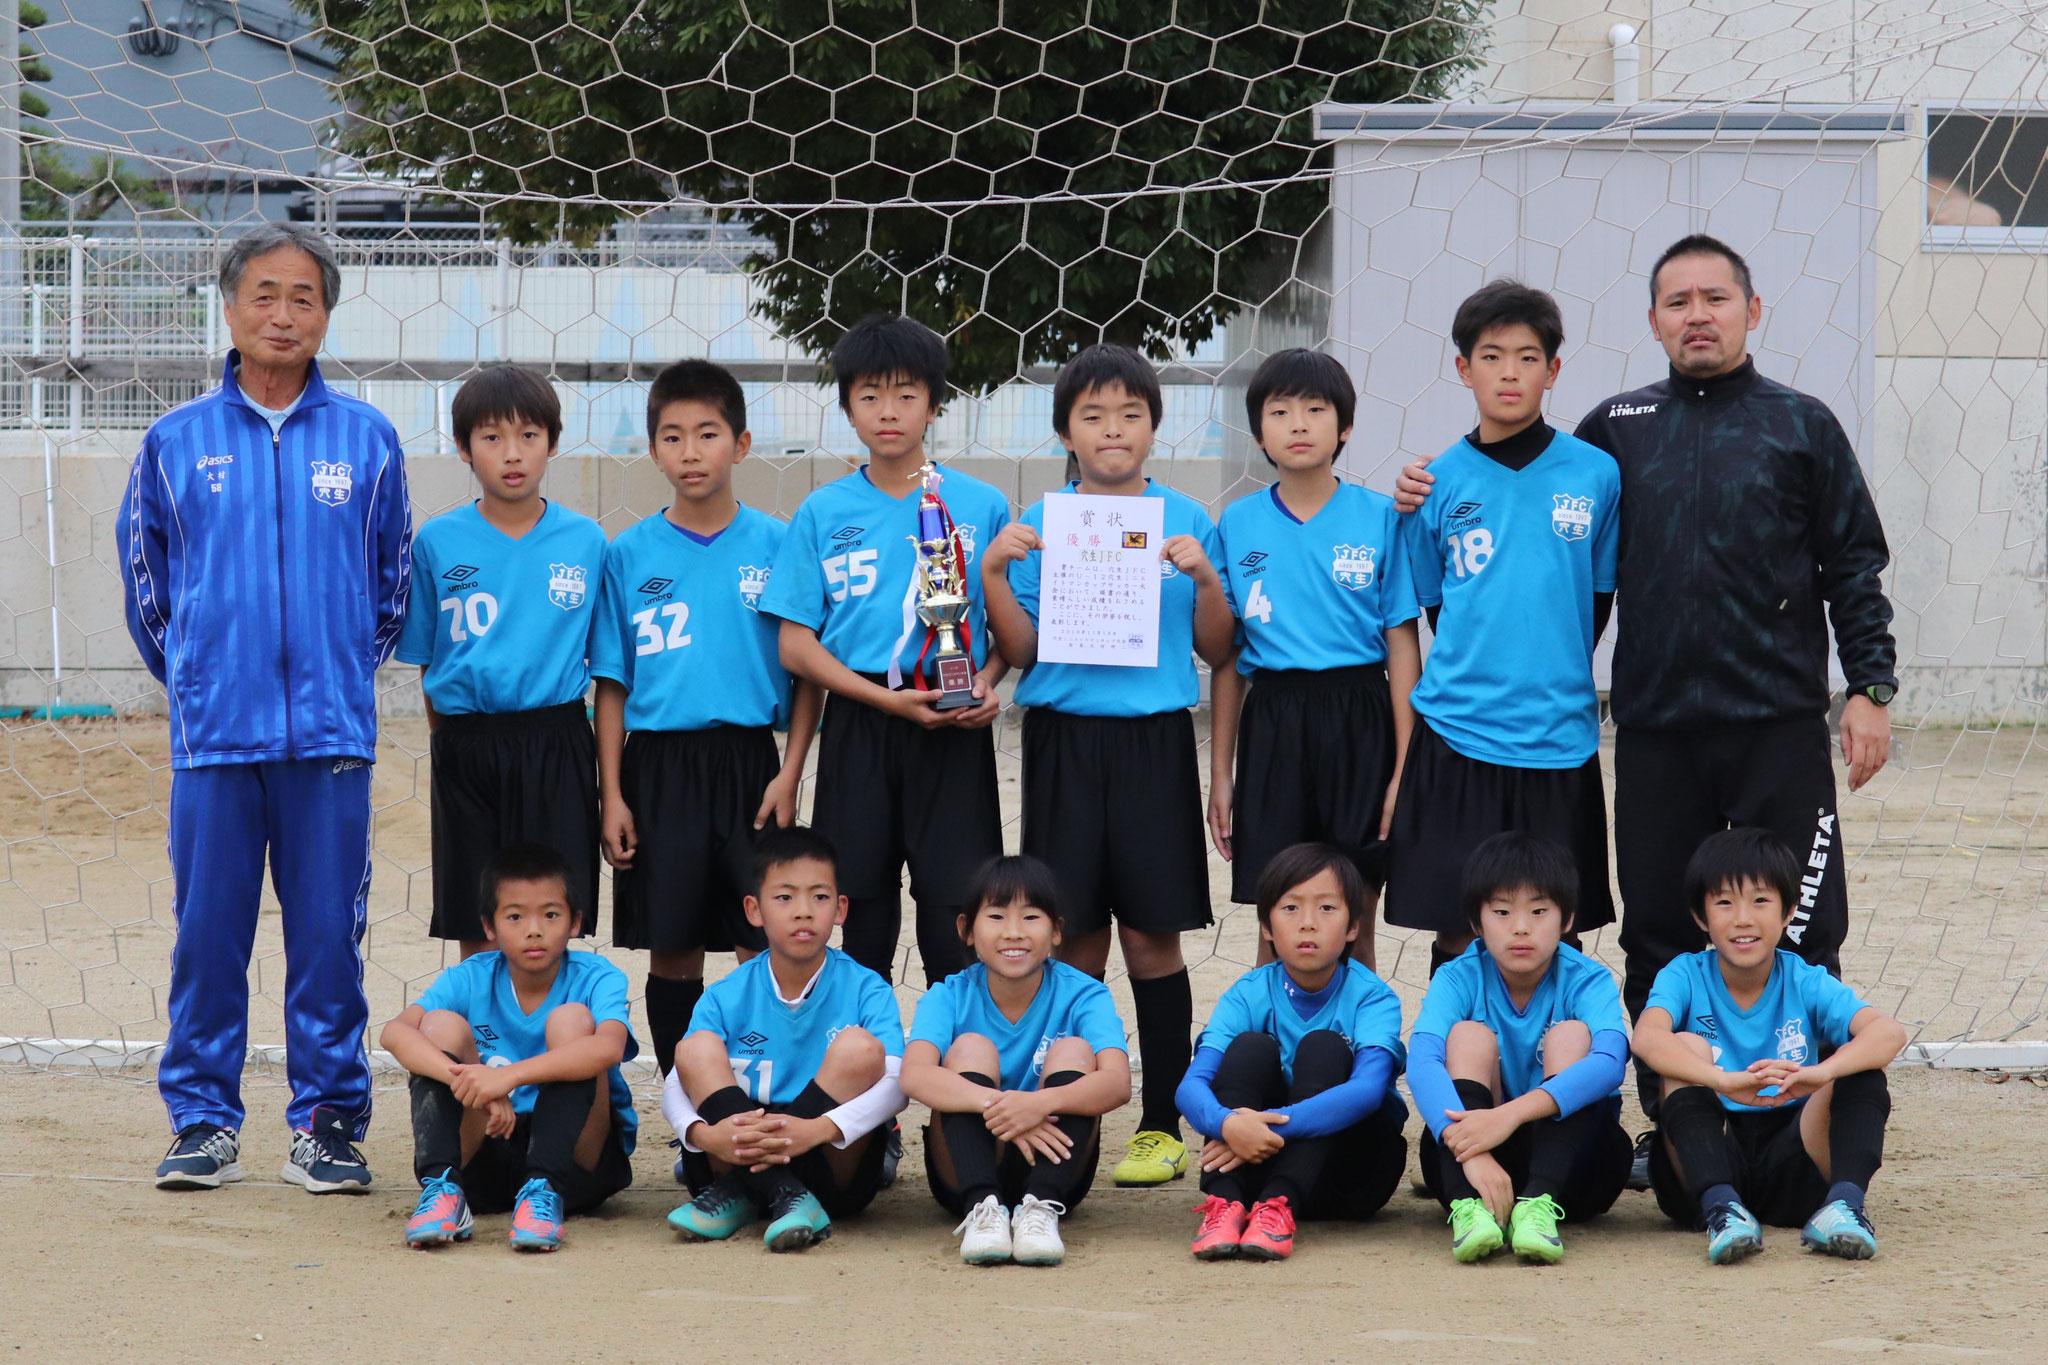 U-12穴生ミニエイトマンカップ  優勝! 2018/11/18